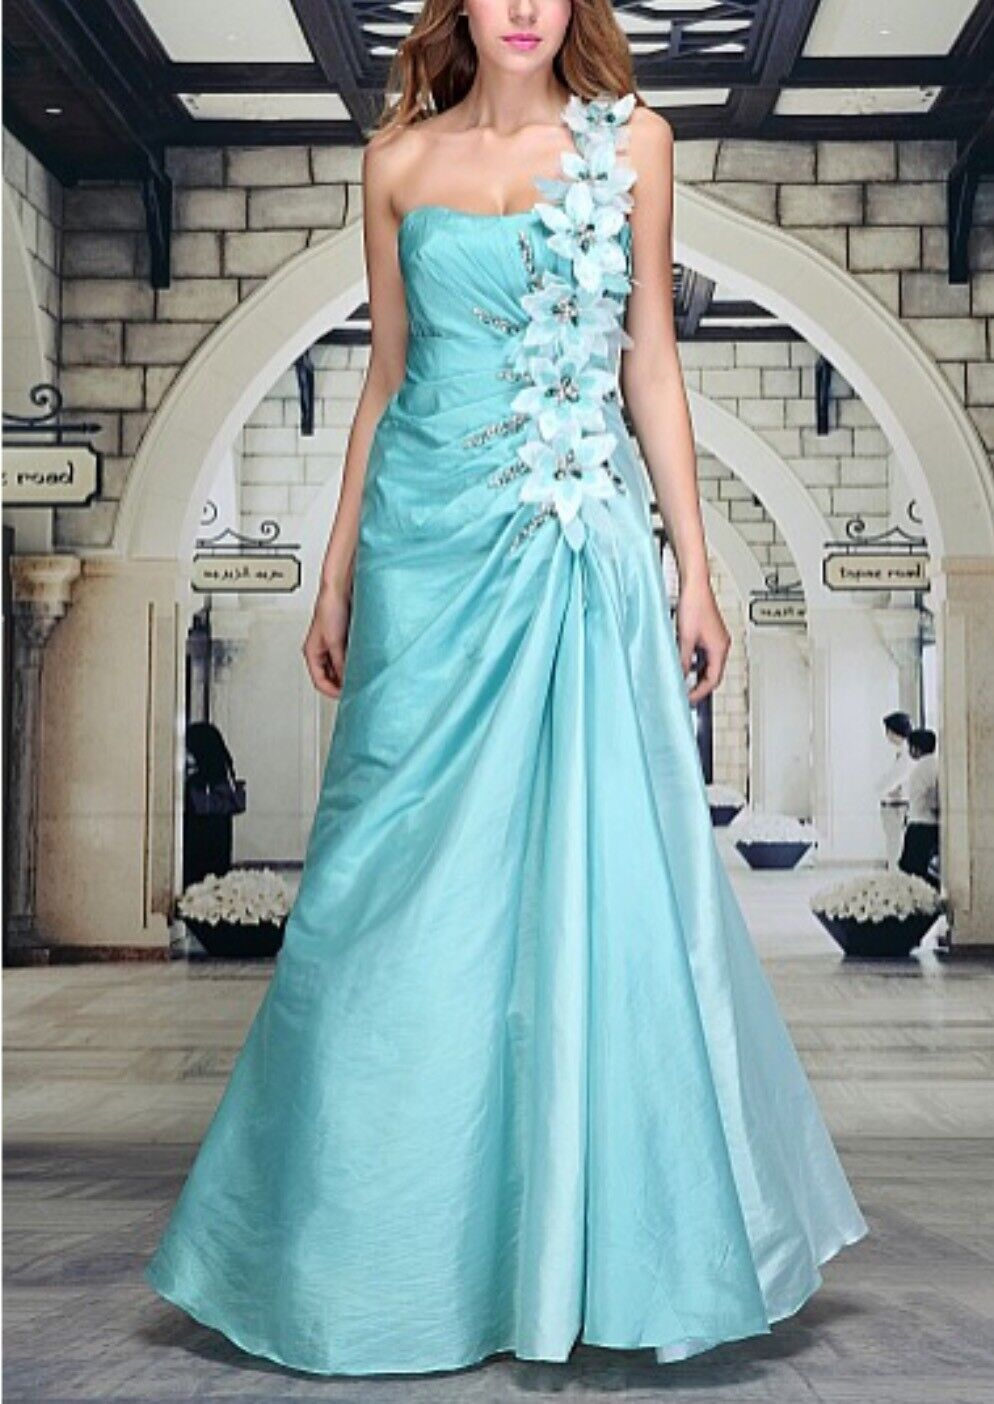 Abendkleid Ballkleid Brautkleid Designerkleid Abiballkleid ( 1077-1078), Gr. 38 38 38 | Lebhaft  | Angemessener Preis  | Helle Farben  b13e14